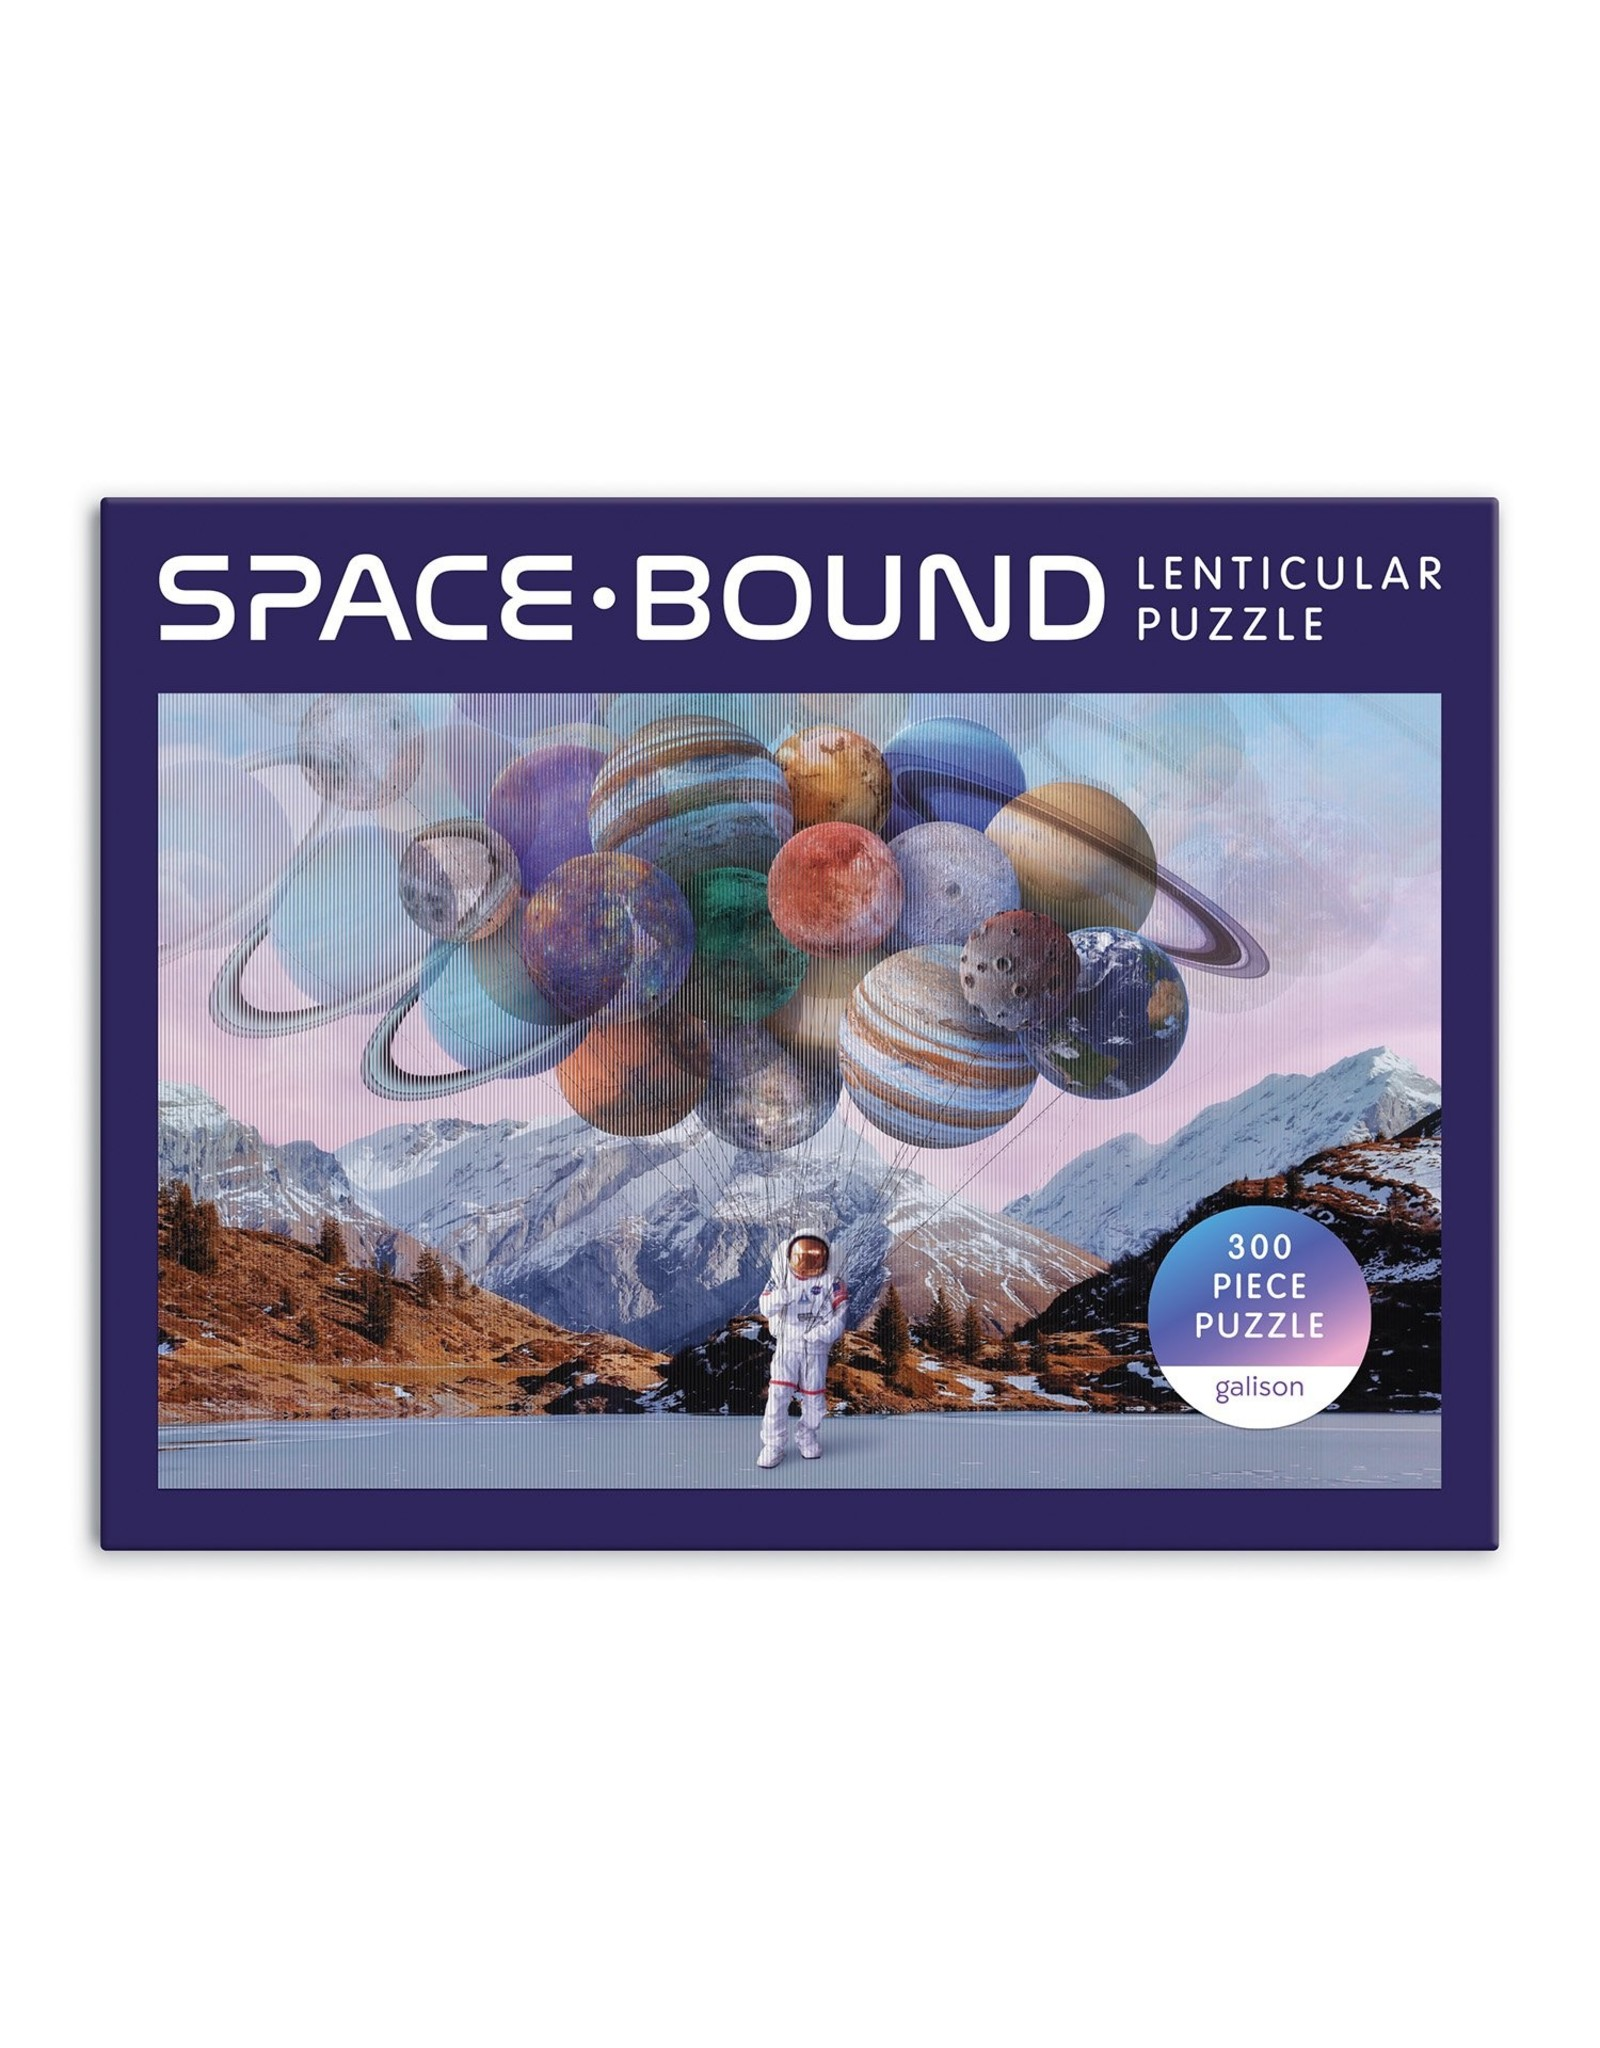 Galison Space Bound 300 Piece Lenticular Puzzle